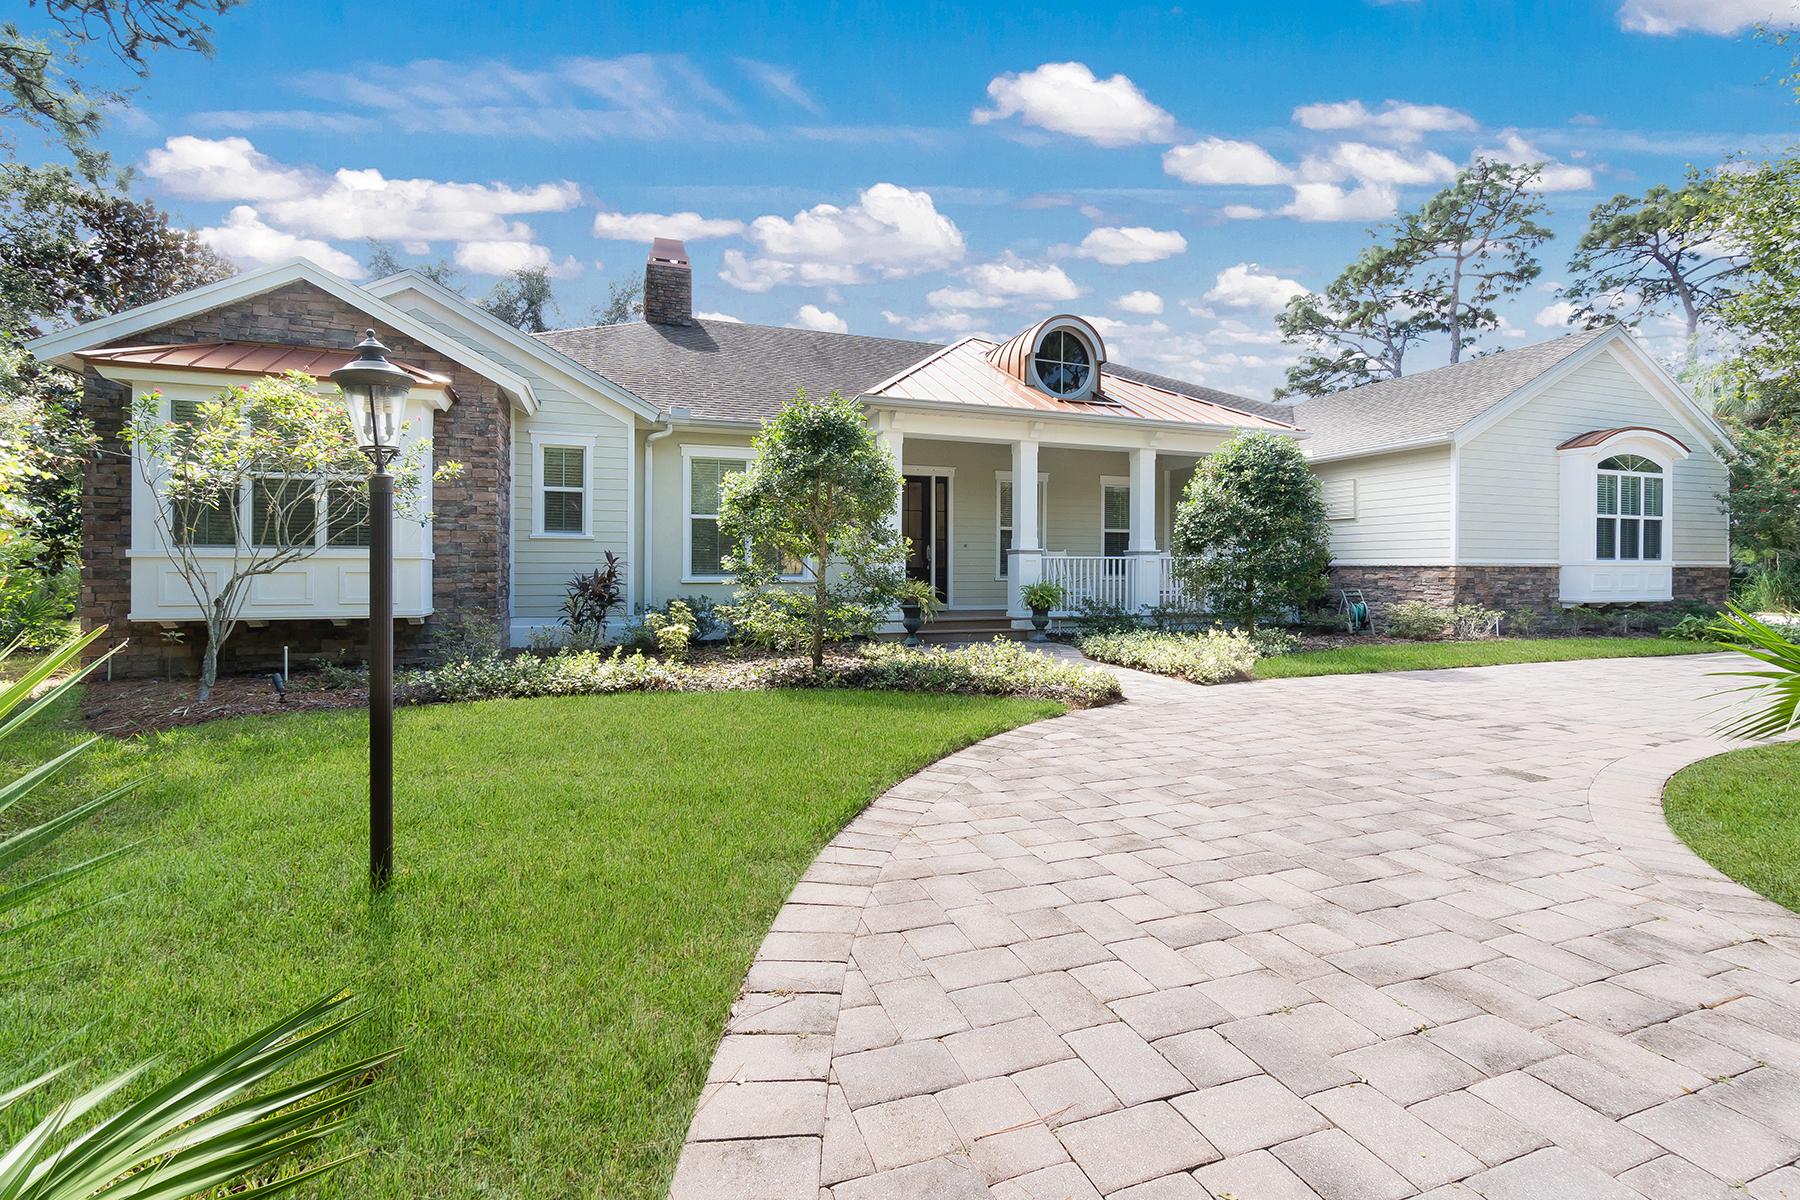 獨棟家庭住宅 為 出售 在 RIVER FOREST 5959 River Forest Cir Bradenton, 佛羅里達州, 34203 美國